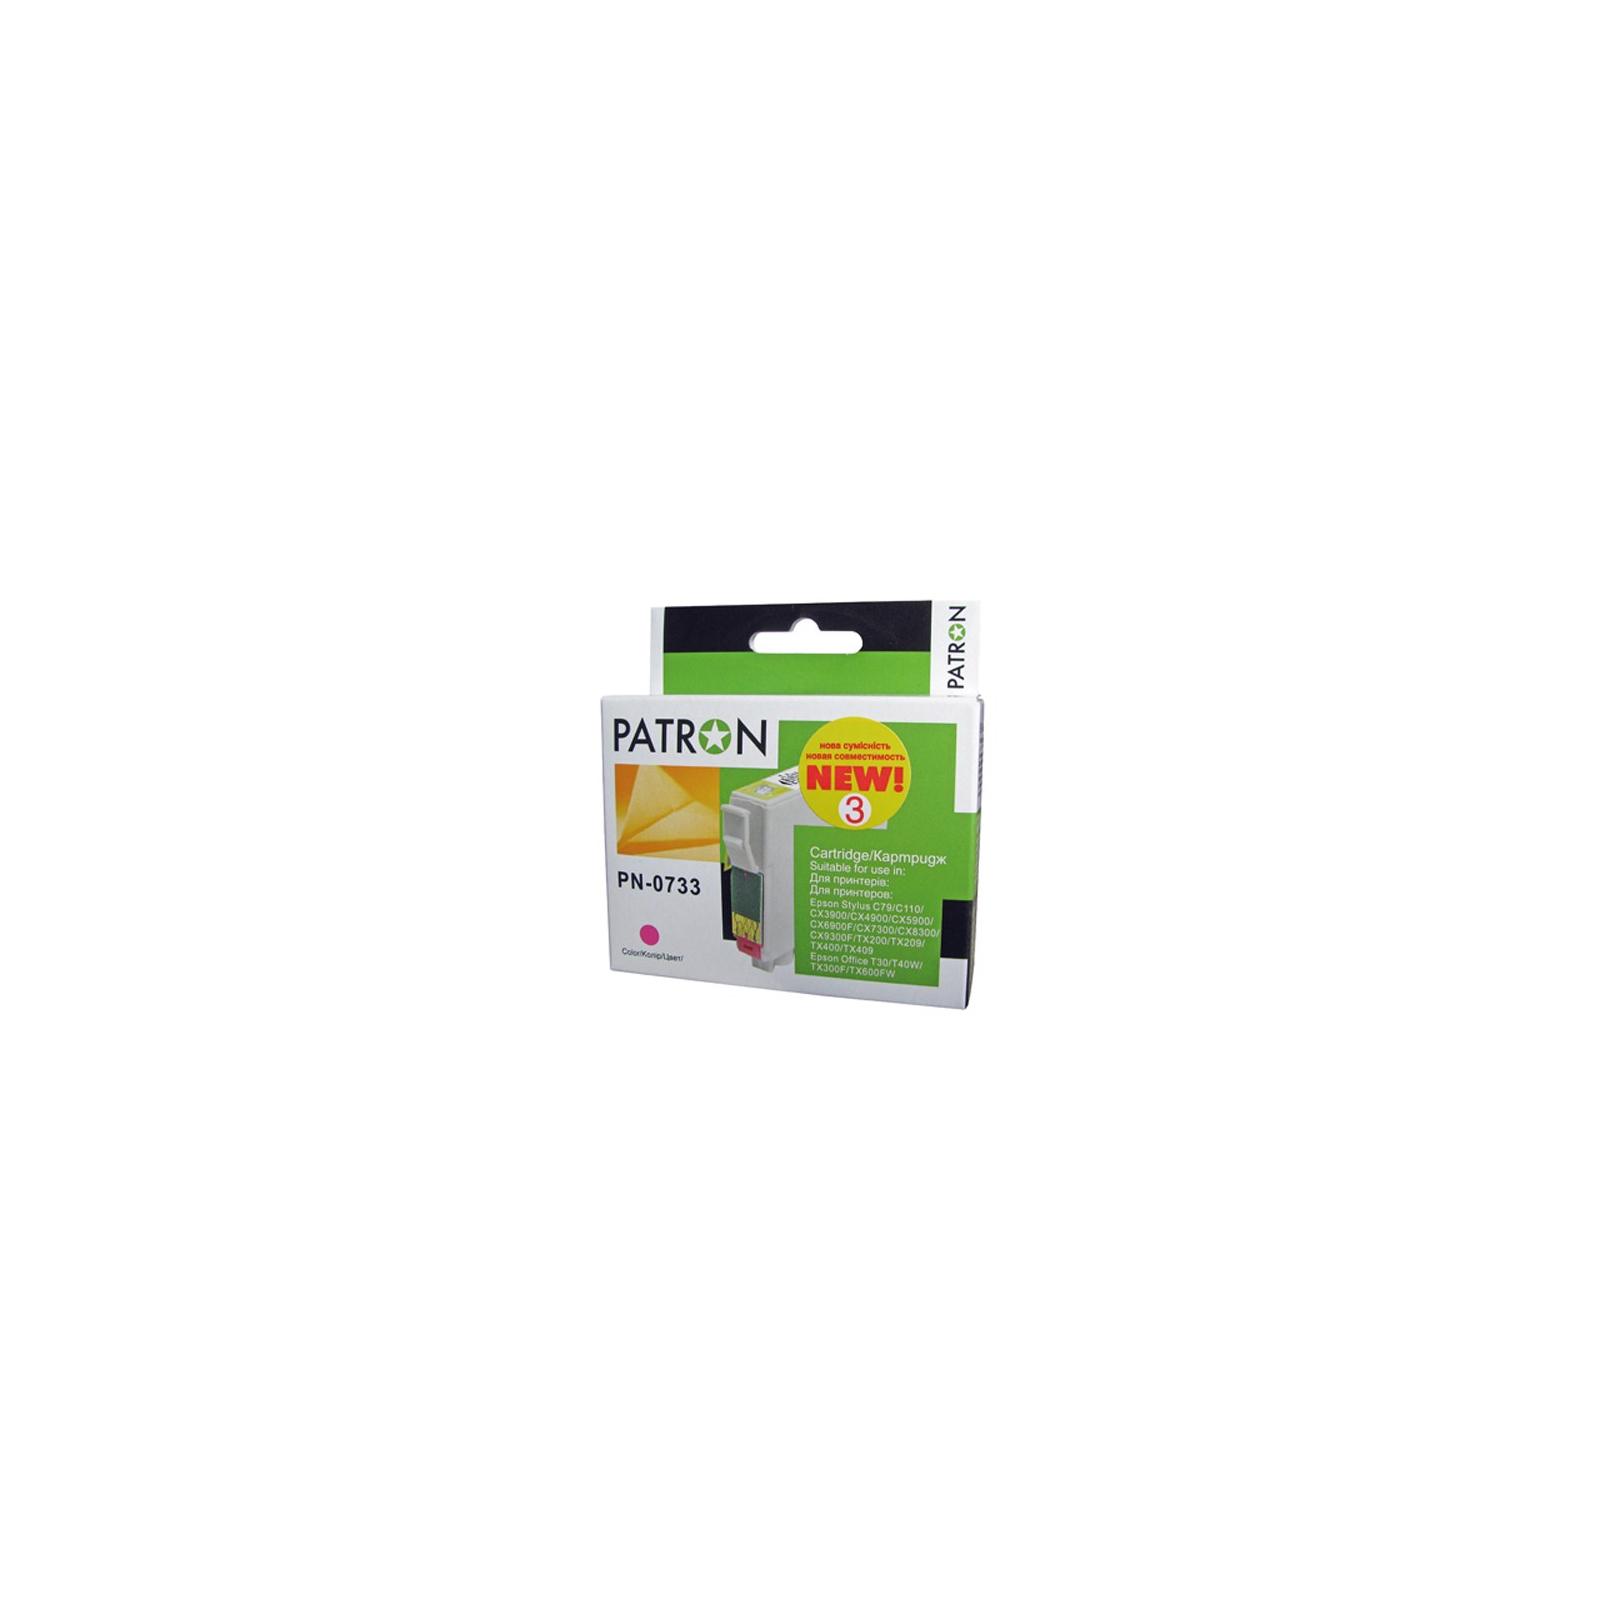 Картридж PATRON для EPSON C79/C110/TX200 magenta (CI-EPS-T07334-M3-PN)